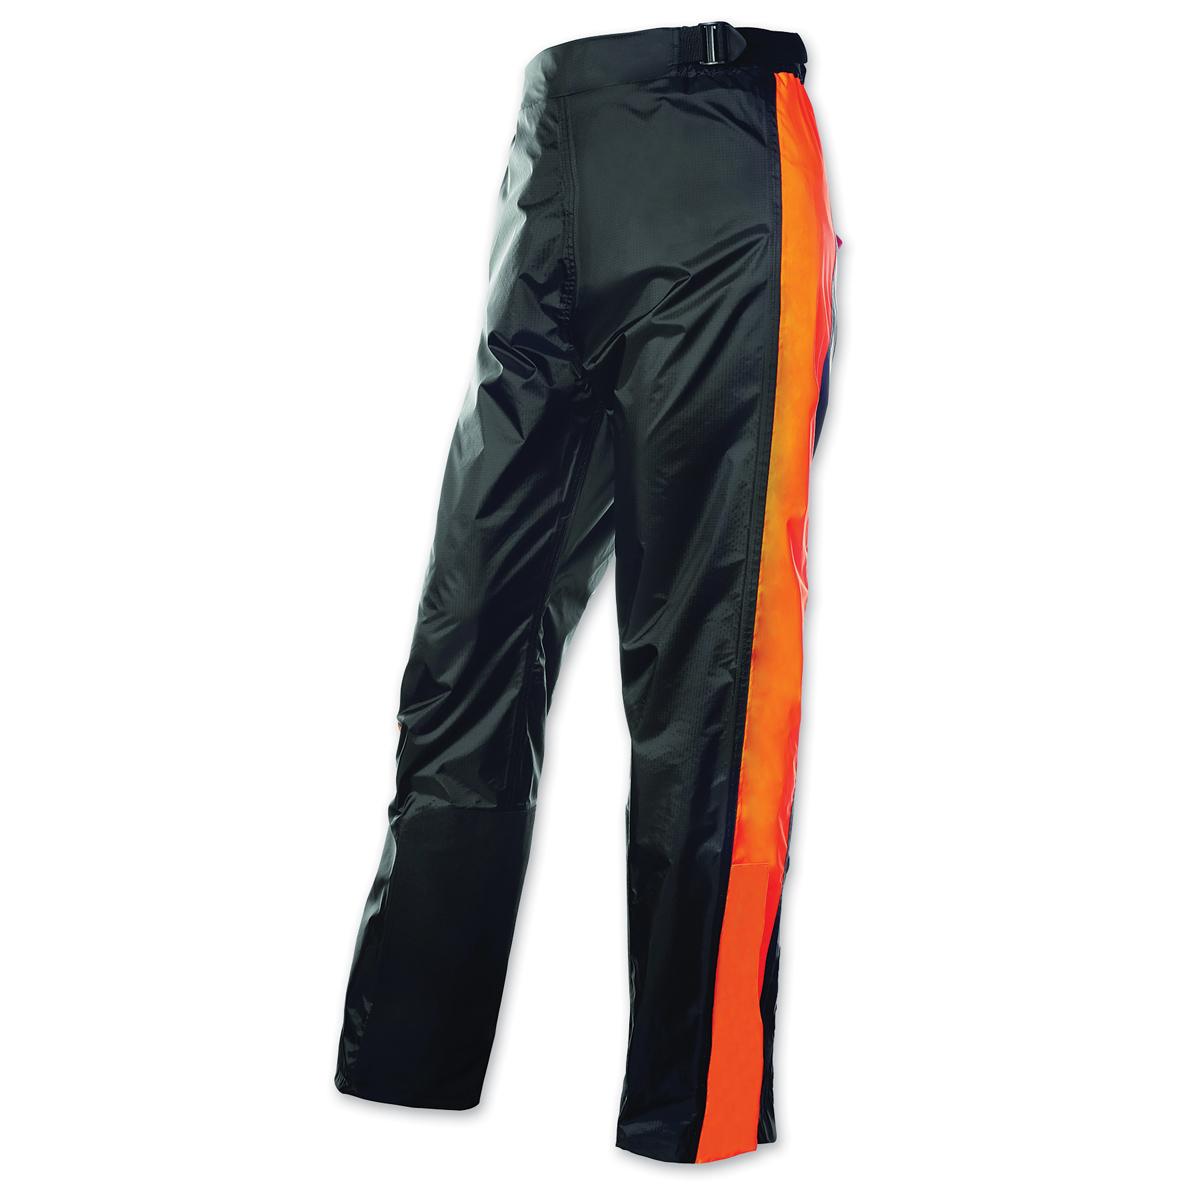 Olympia Moto Sports Unisex Horizon Neon Orange/Black Rain Pant